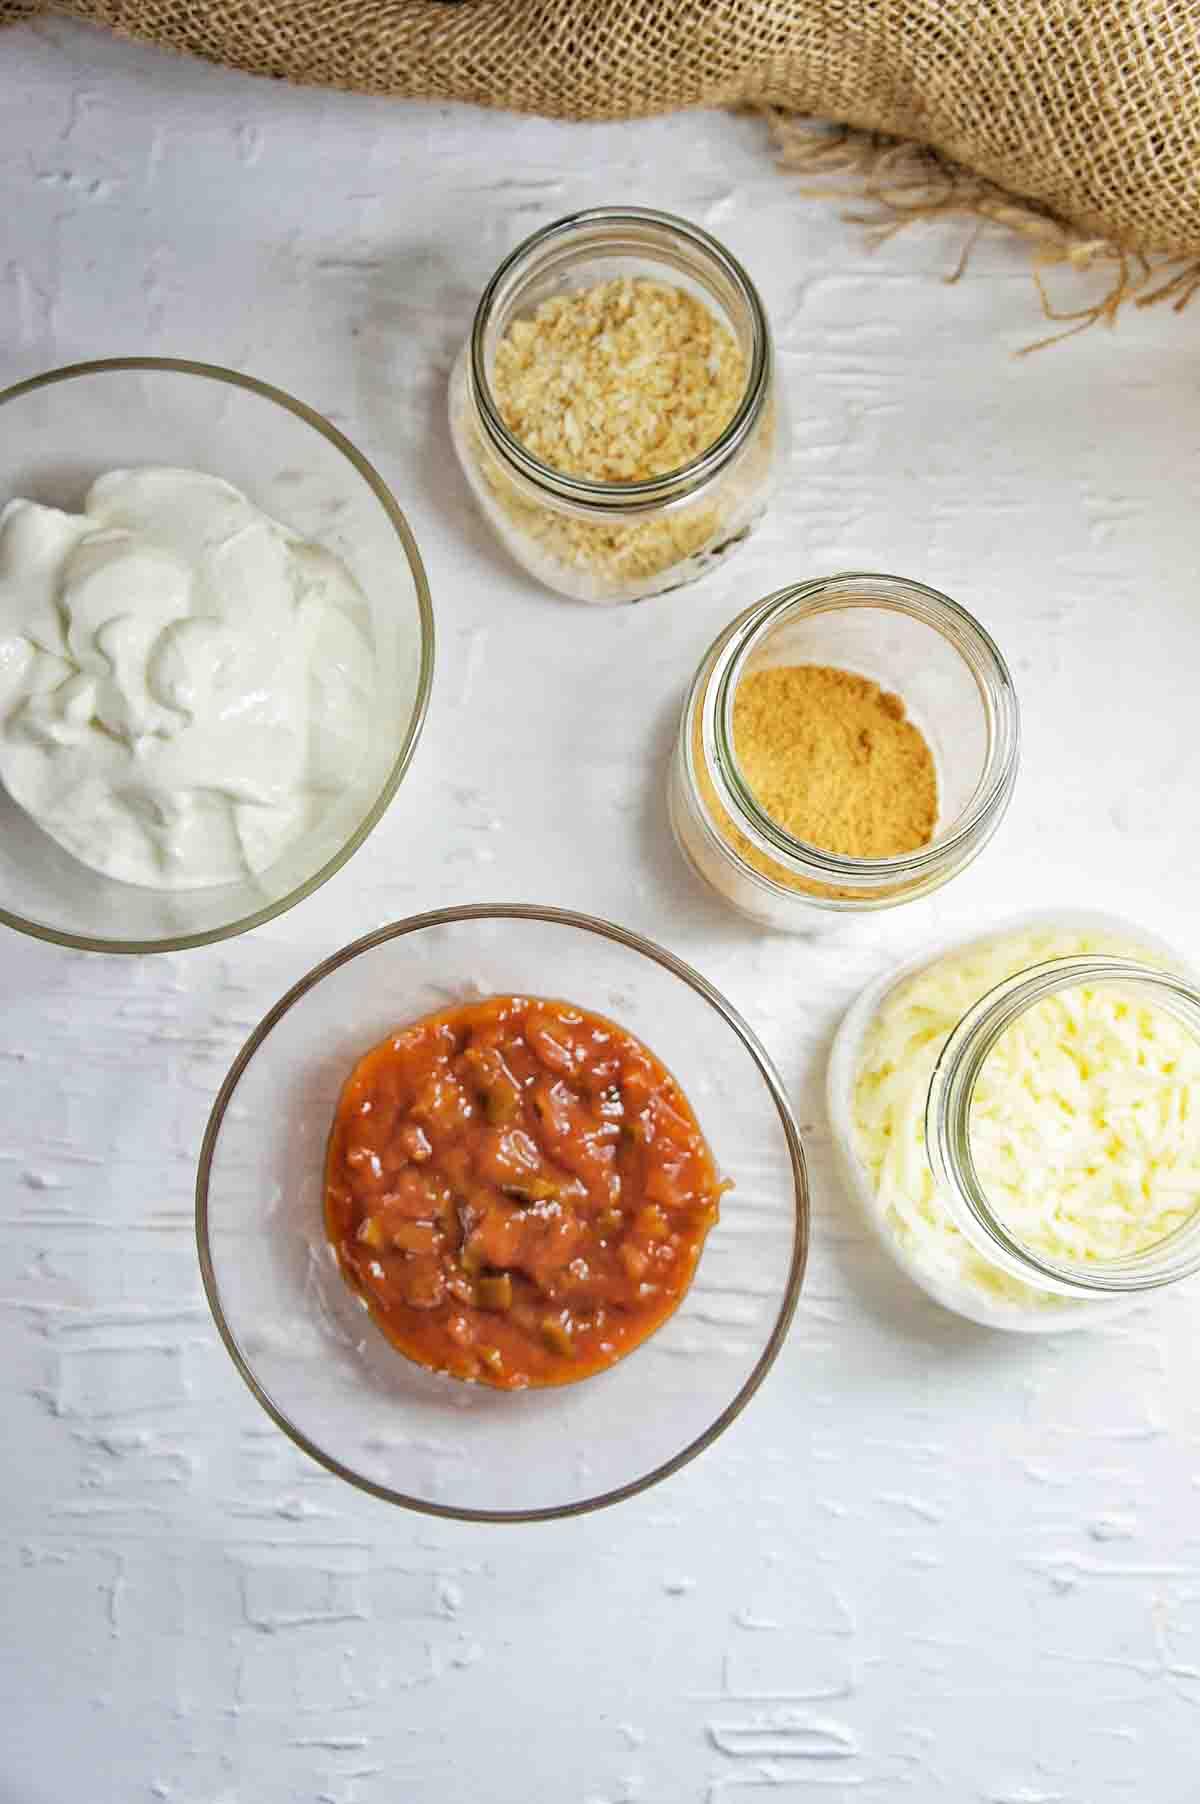 Ingredients for Fiesta Tuna Pasta Bake Sauce